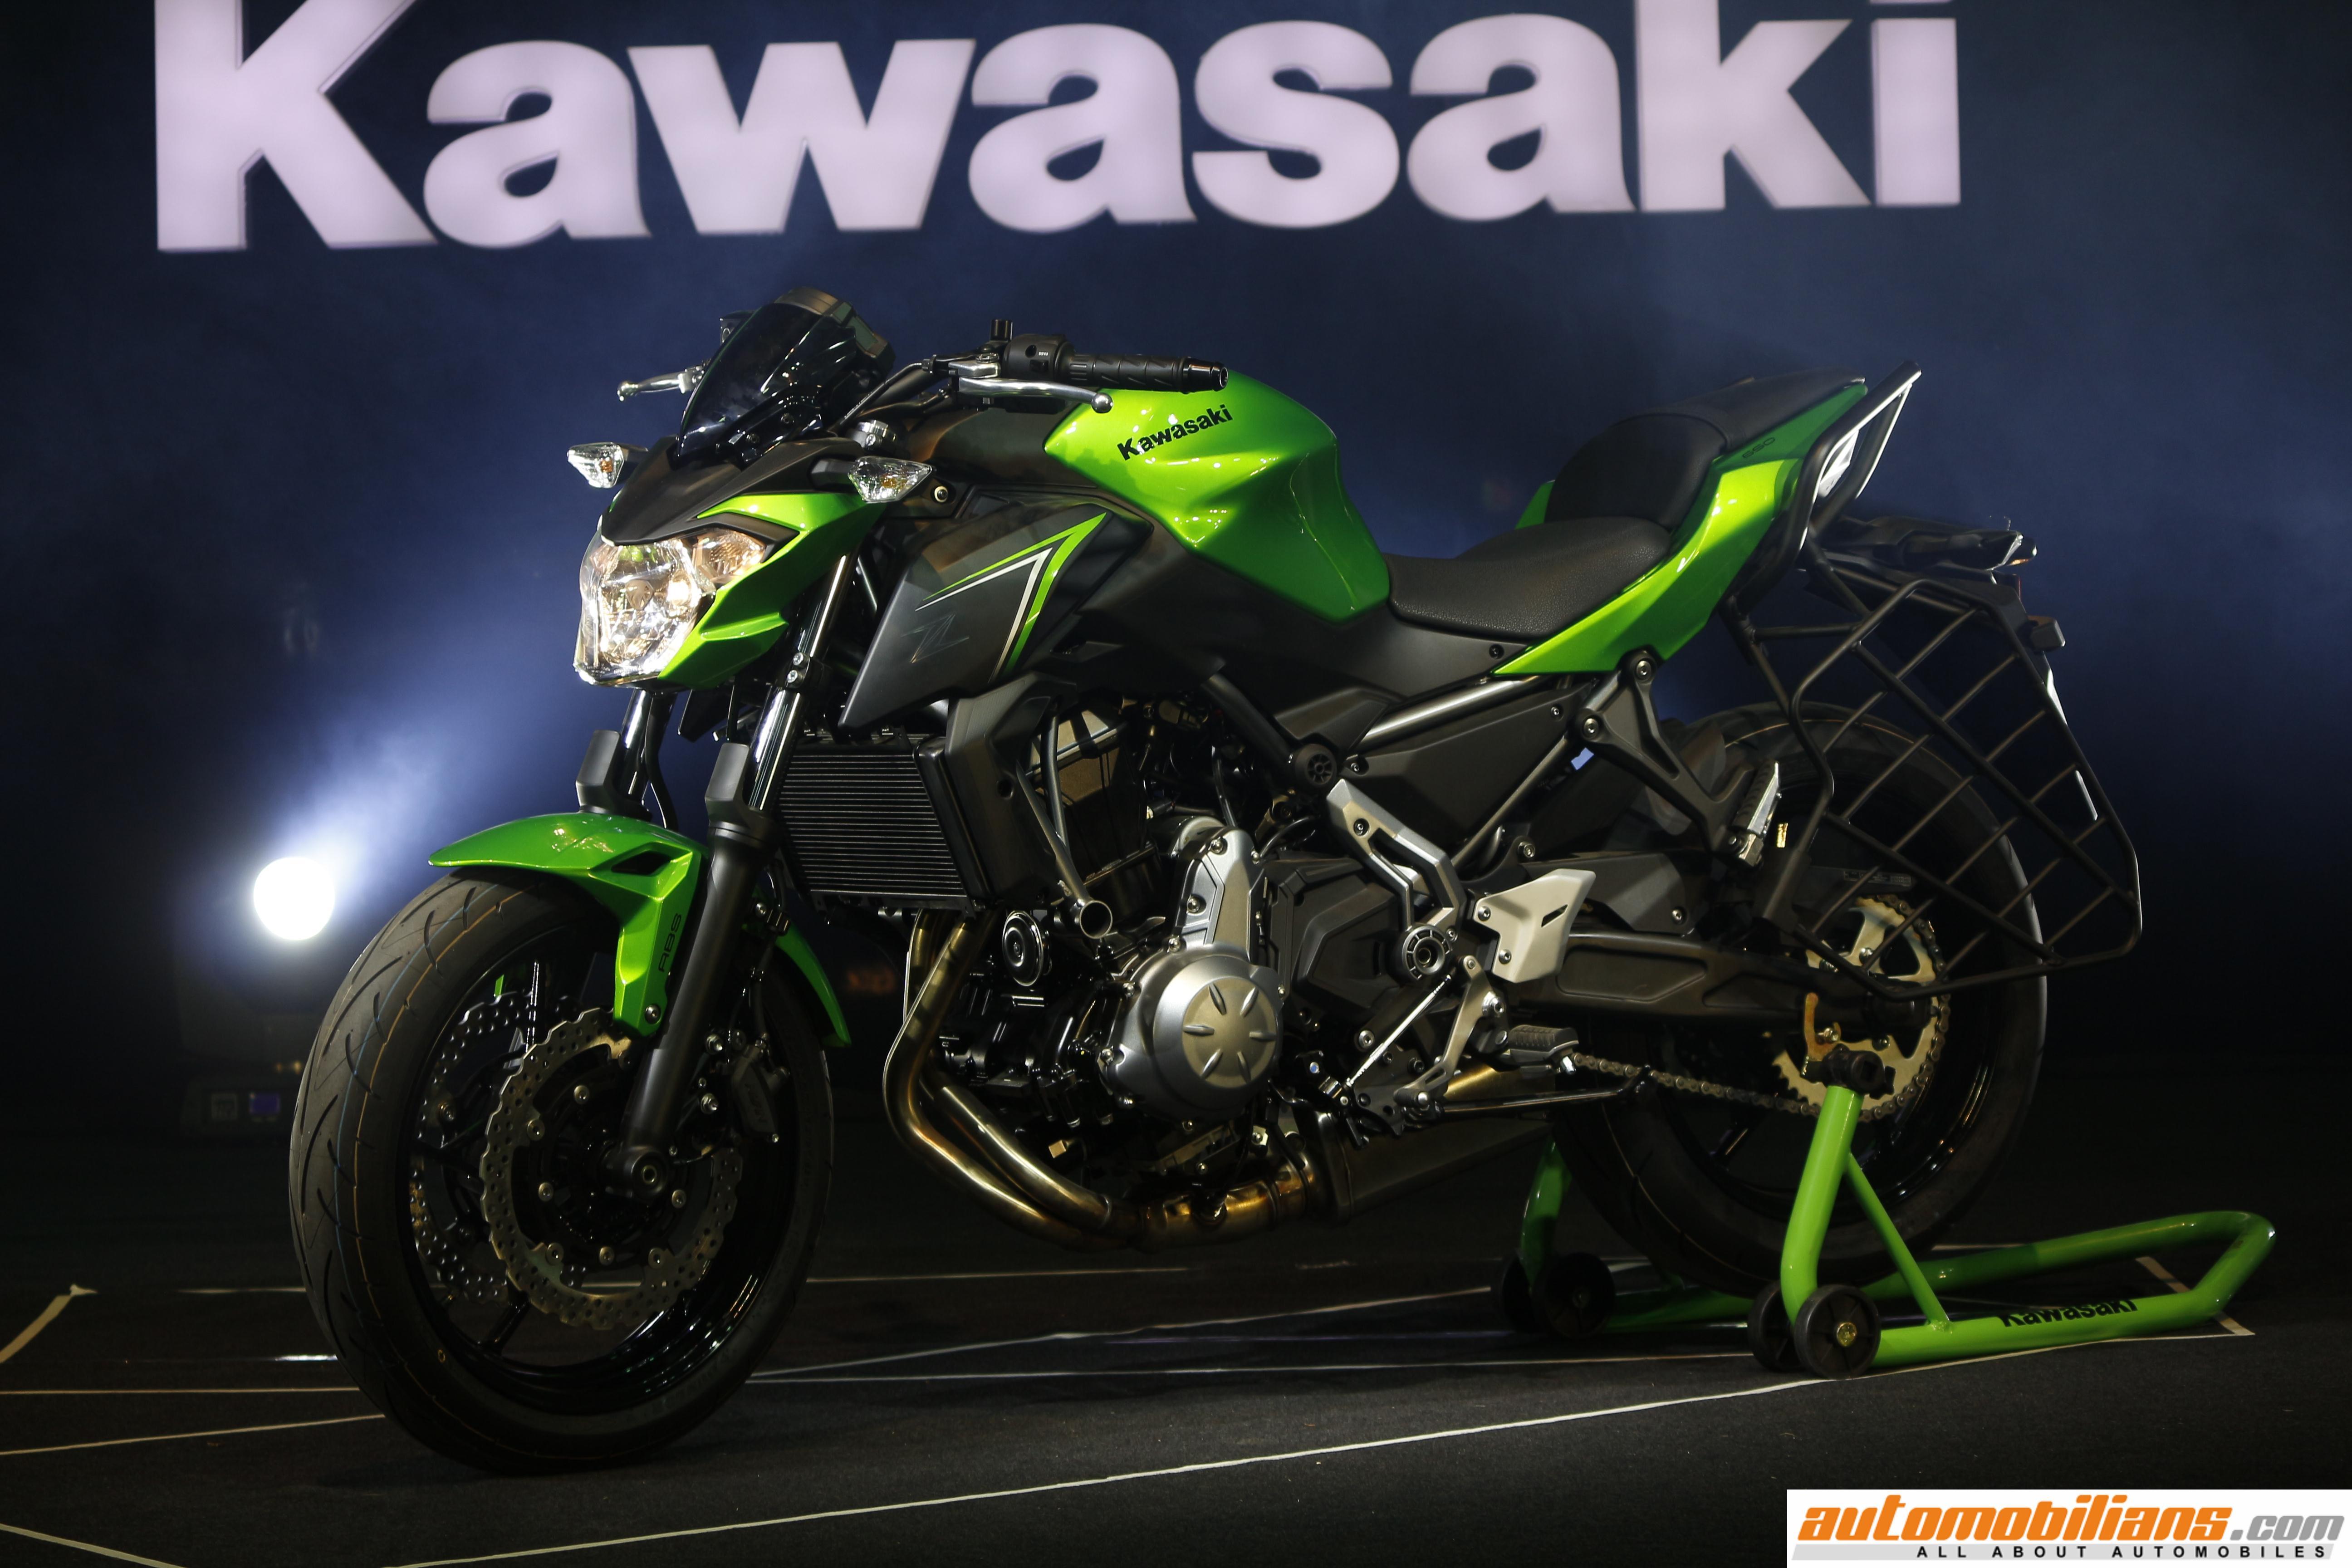 2017 Kawasaki Ninja 300 Ninja 650 Versys 650 Z650 And